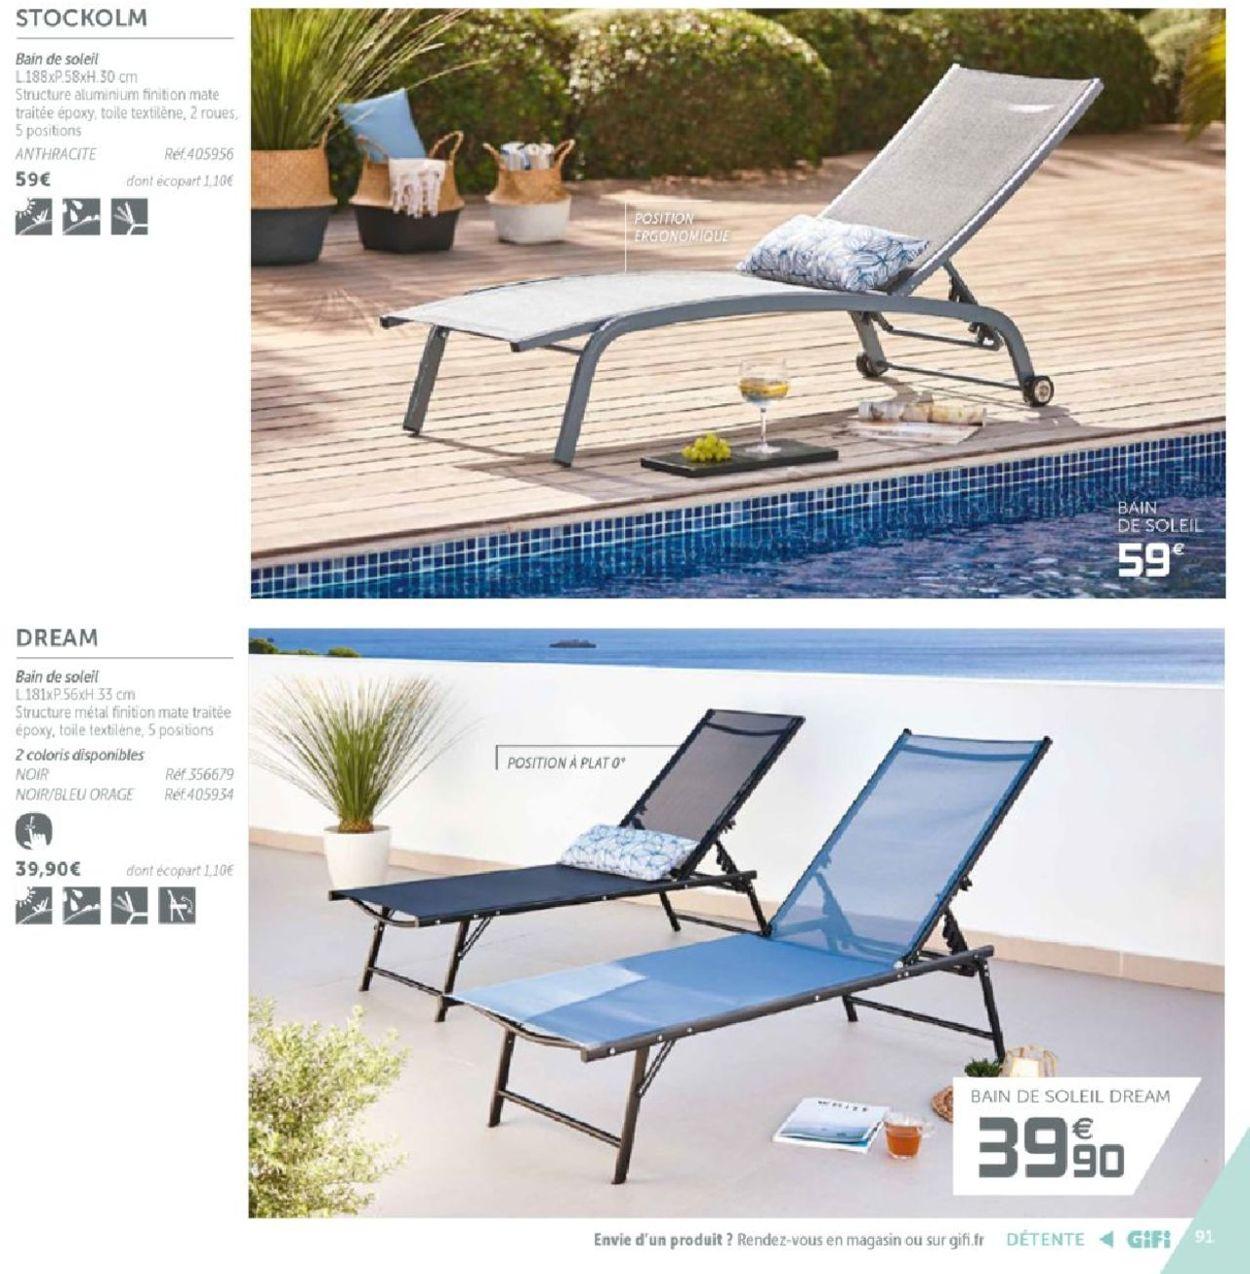 Gifi Catalogue Actuel 14.03 - 31.12.2019 [91] - Catalogue-24 serapportantà Bain De Soleil Dream